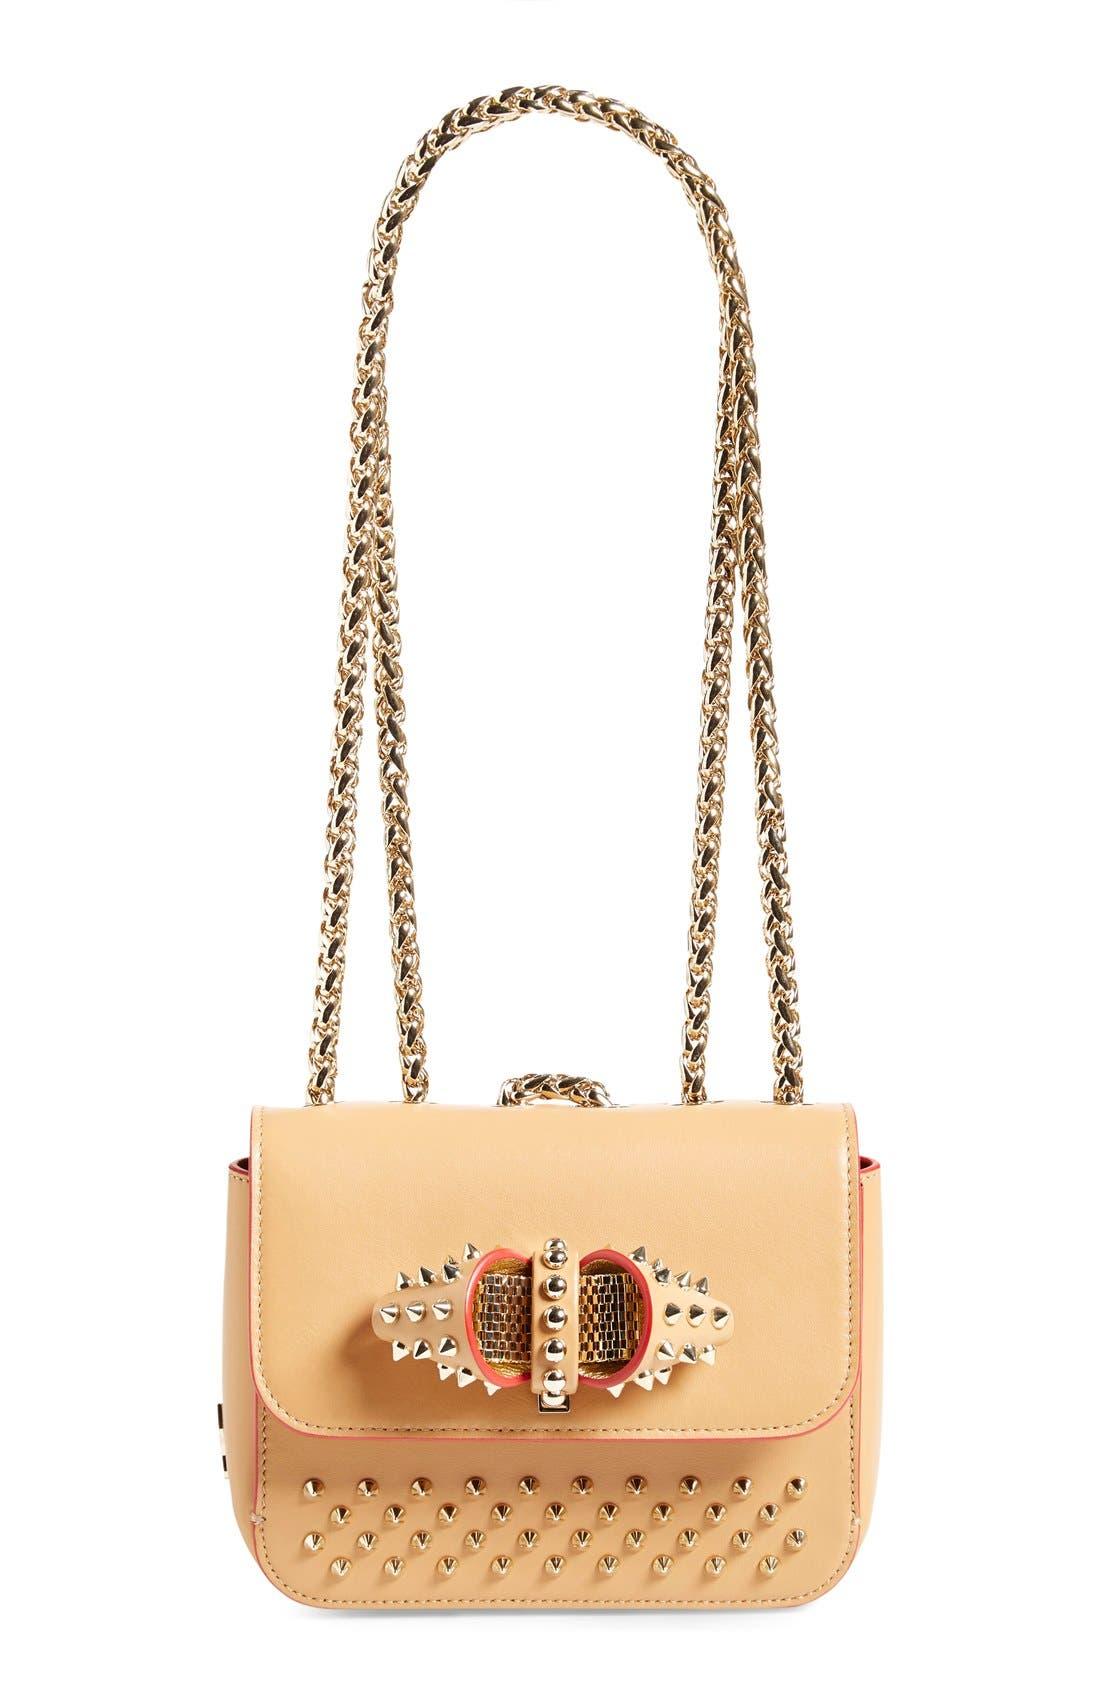 Main Image - Christian Louboutin 'Sweet Charity' Spike Calfskin Shoulder Bag